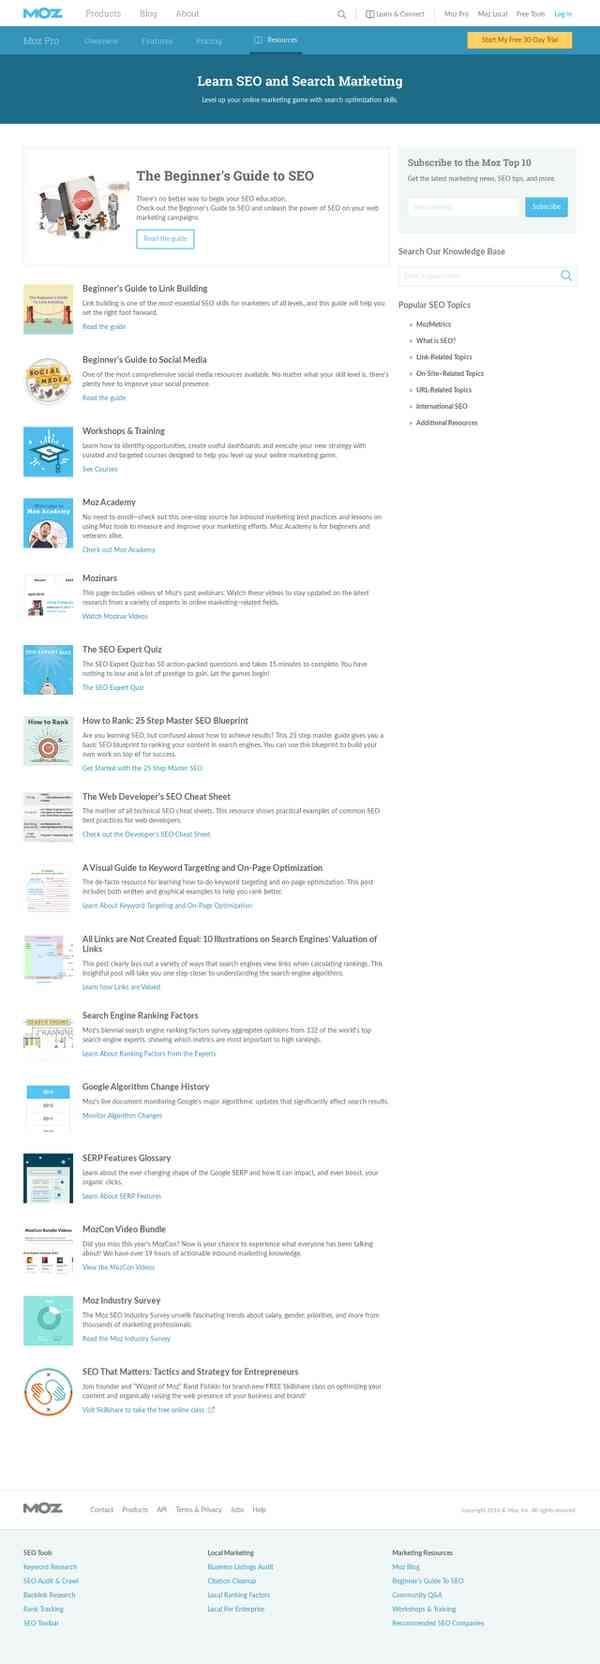 moz.com/learn/seo